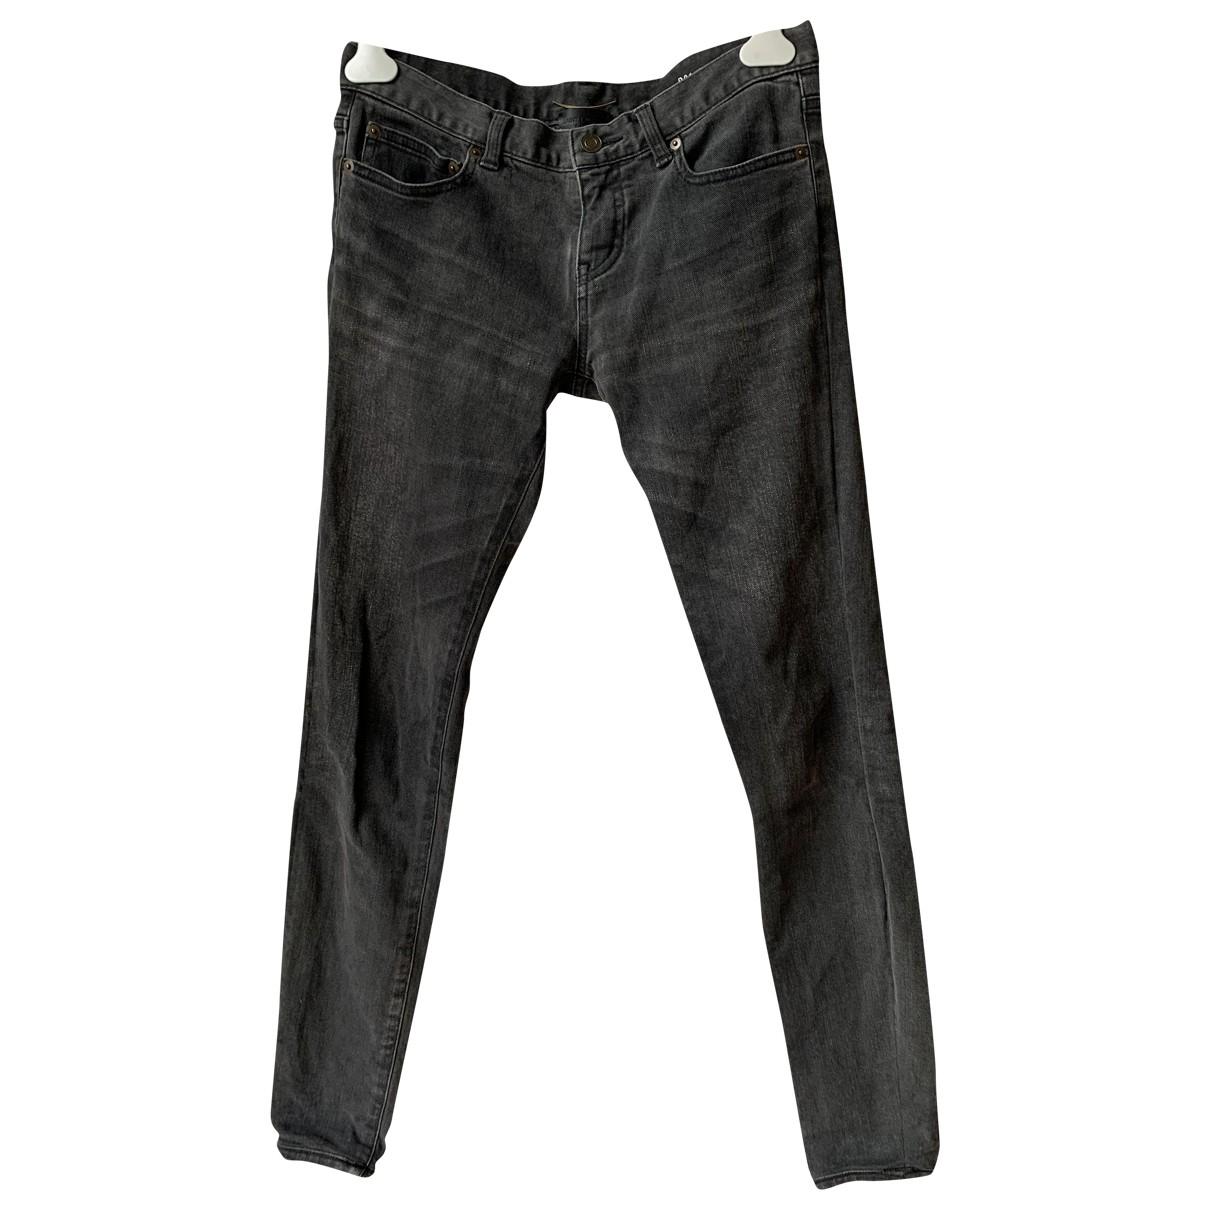 Saint Laurent \N Grey Cotton - elasthane Jeans for Women 28 US